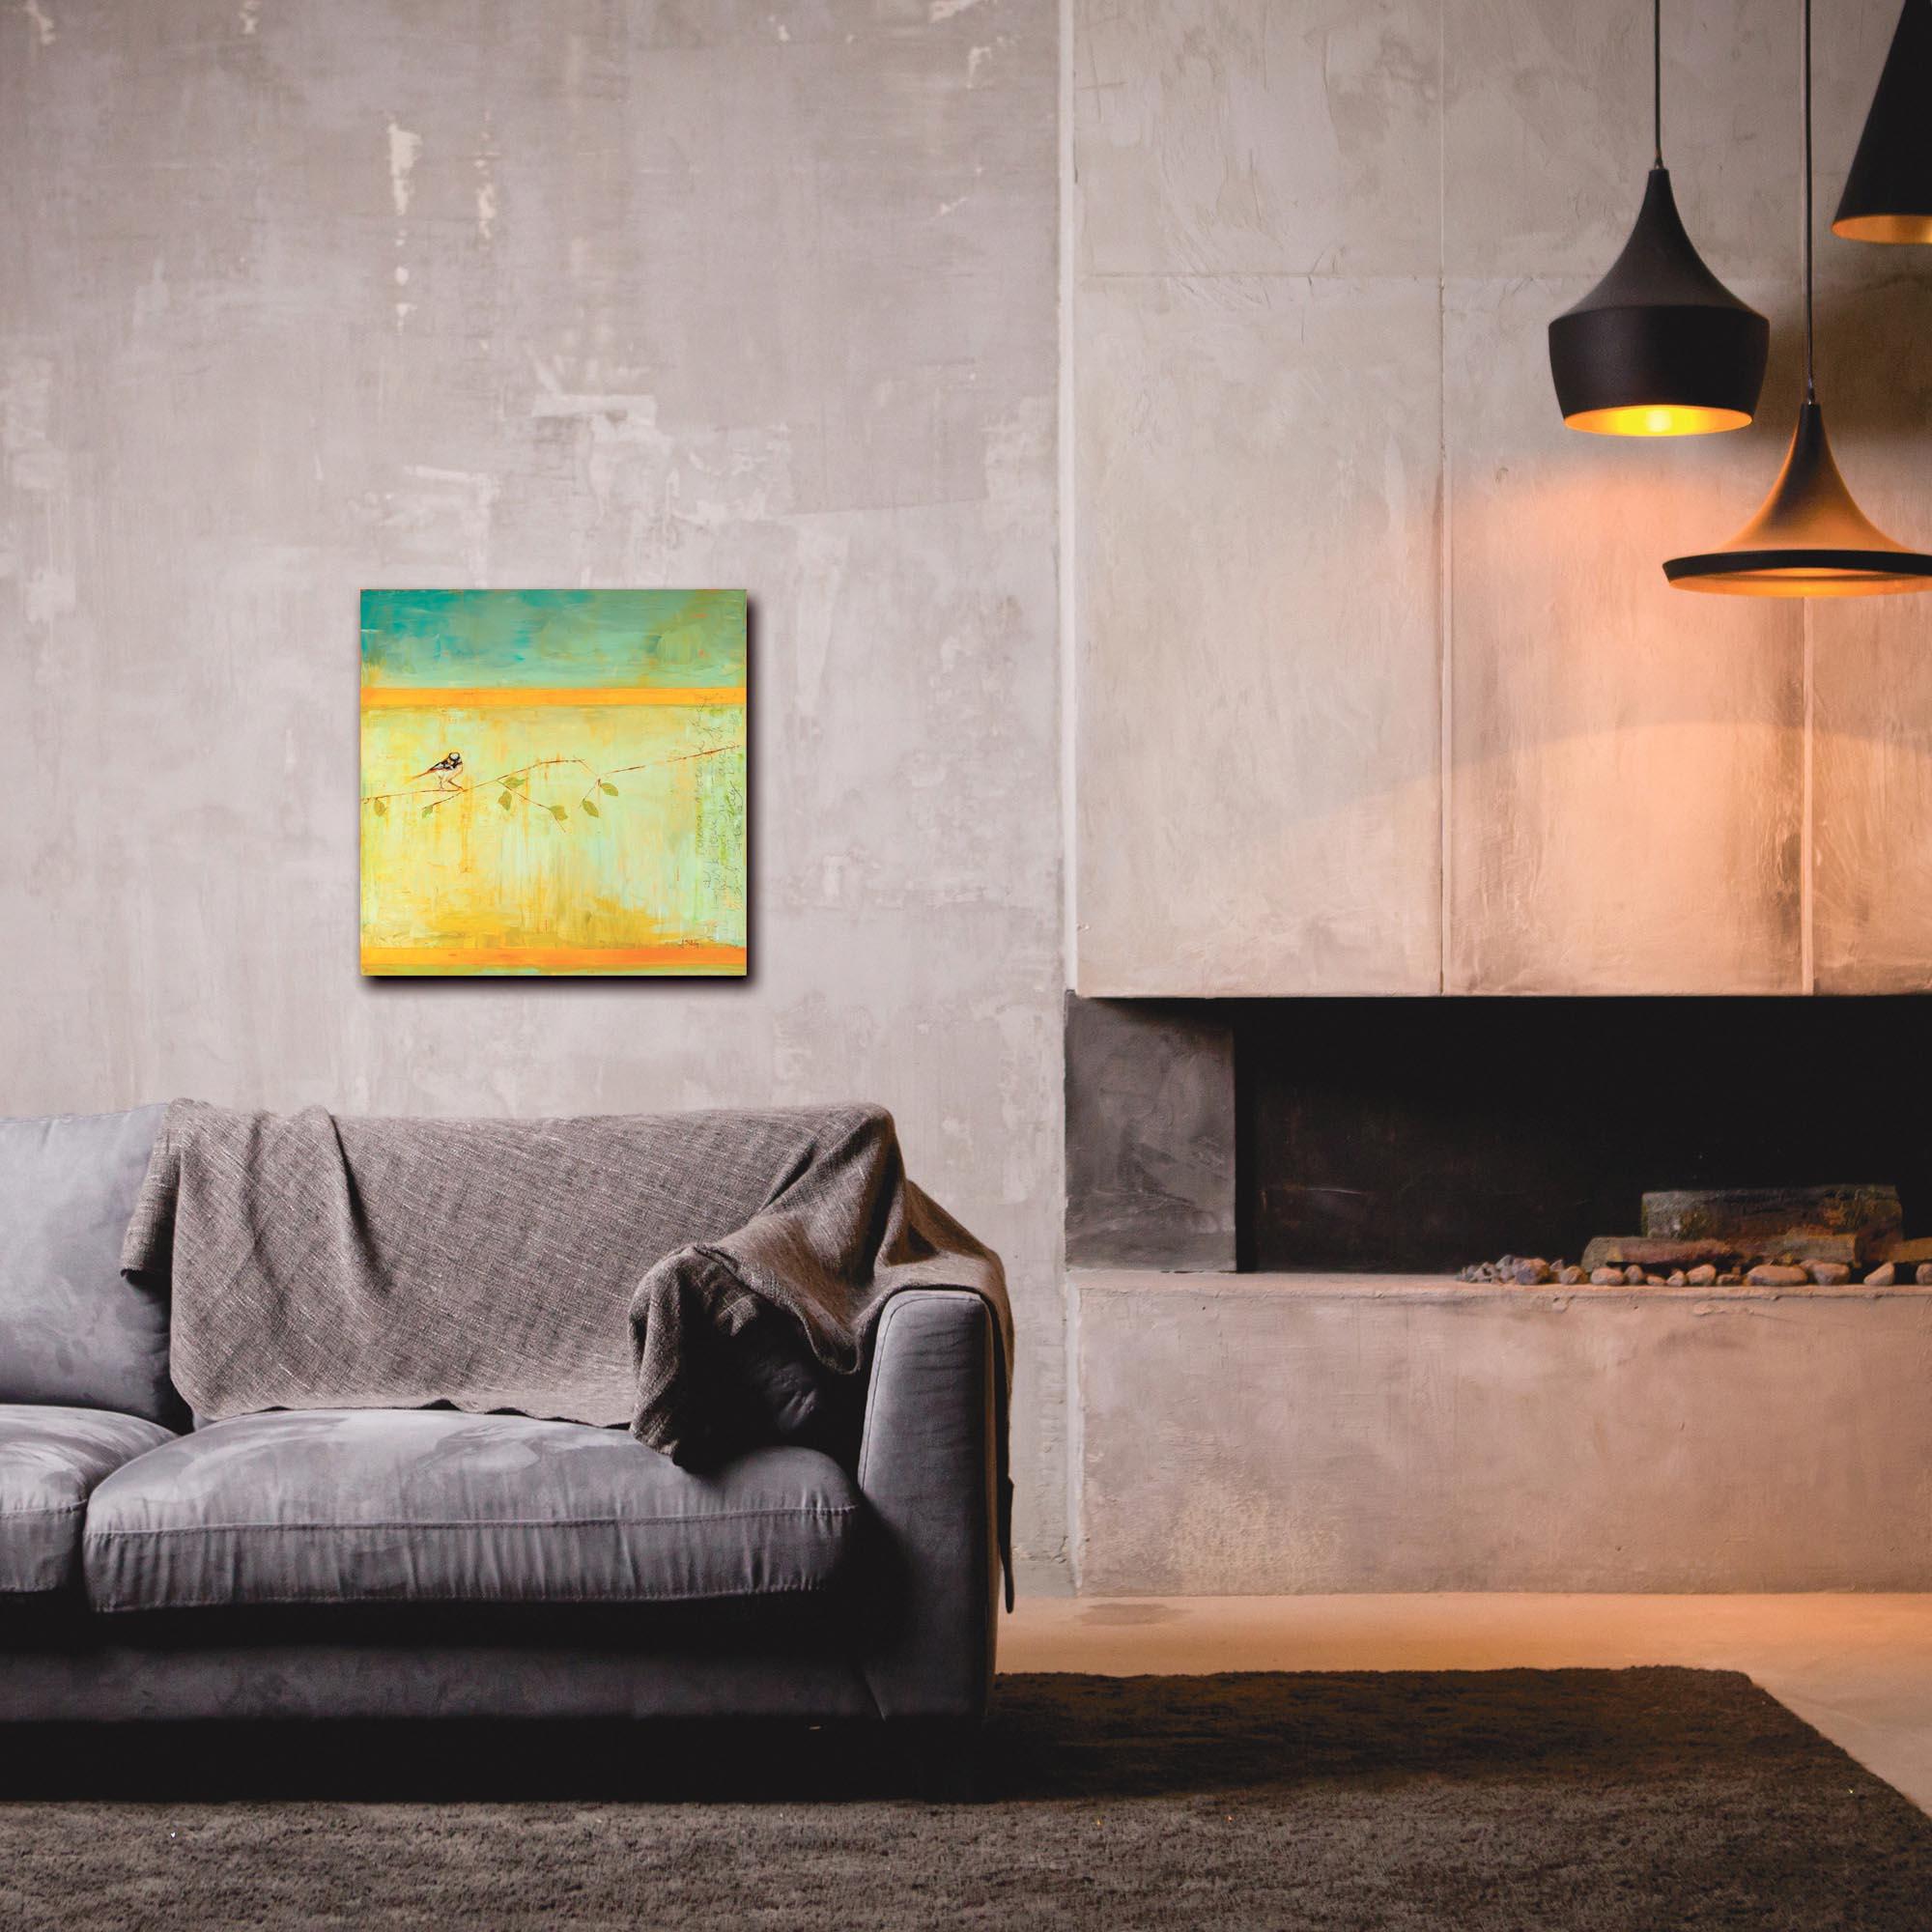 Contemporary Wall Art 'Bird with Horizontal Stripes' - Urban Birds Decor on Metal or Plexiglass - Lifestyle View